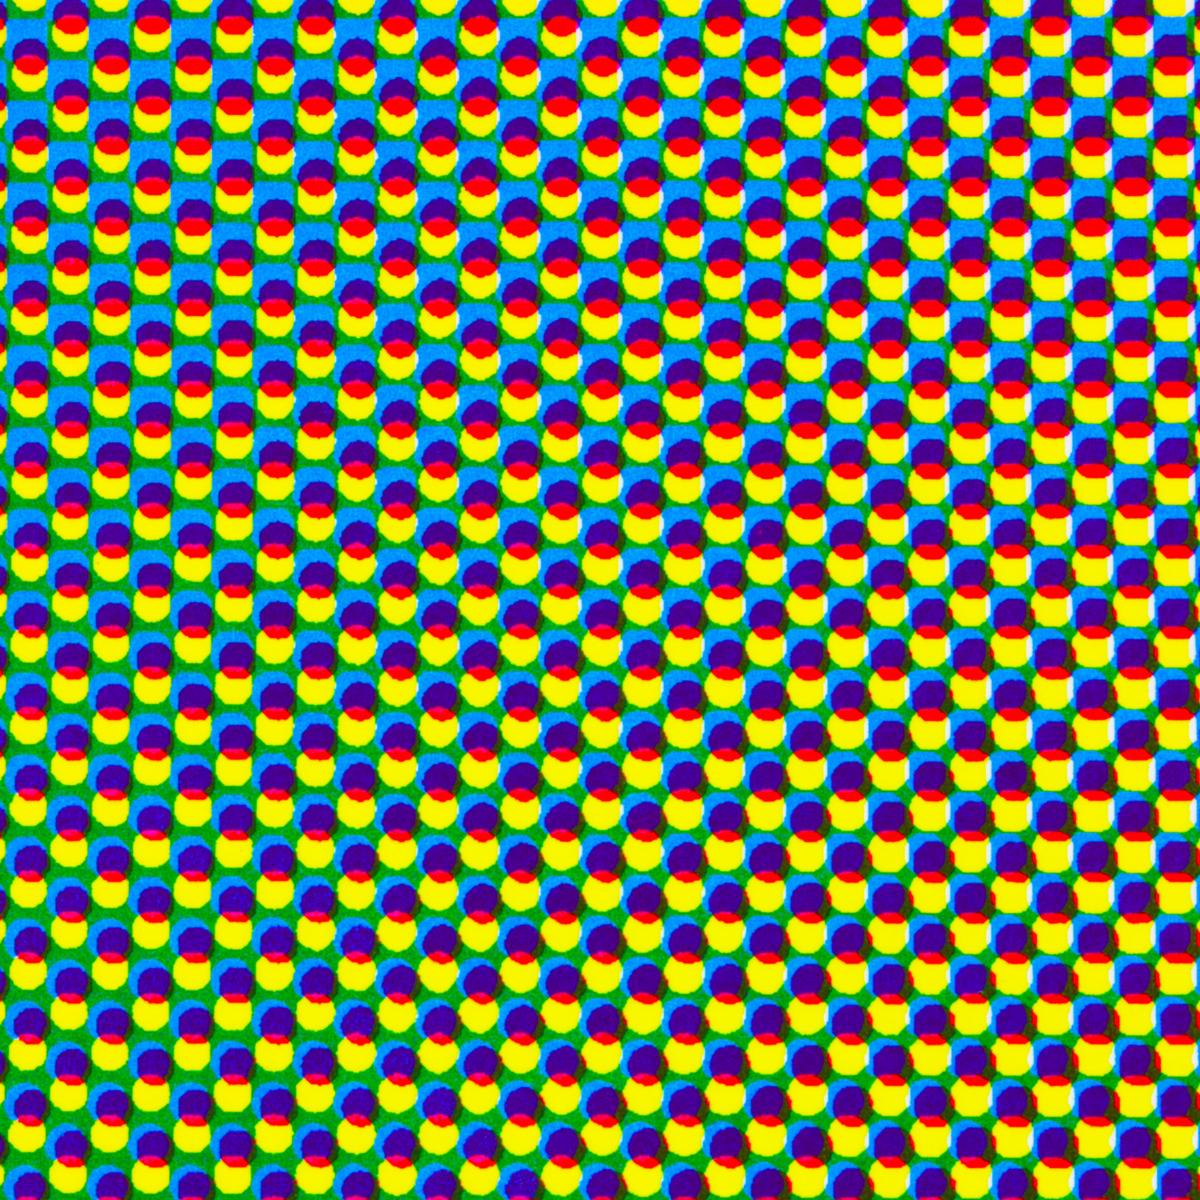 rogier-arents-new-window-gradient-close-up1-1200